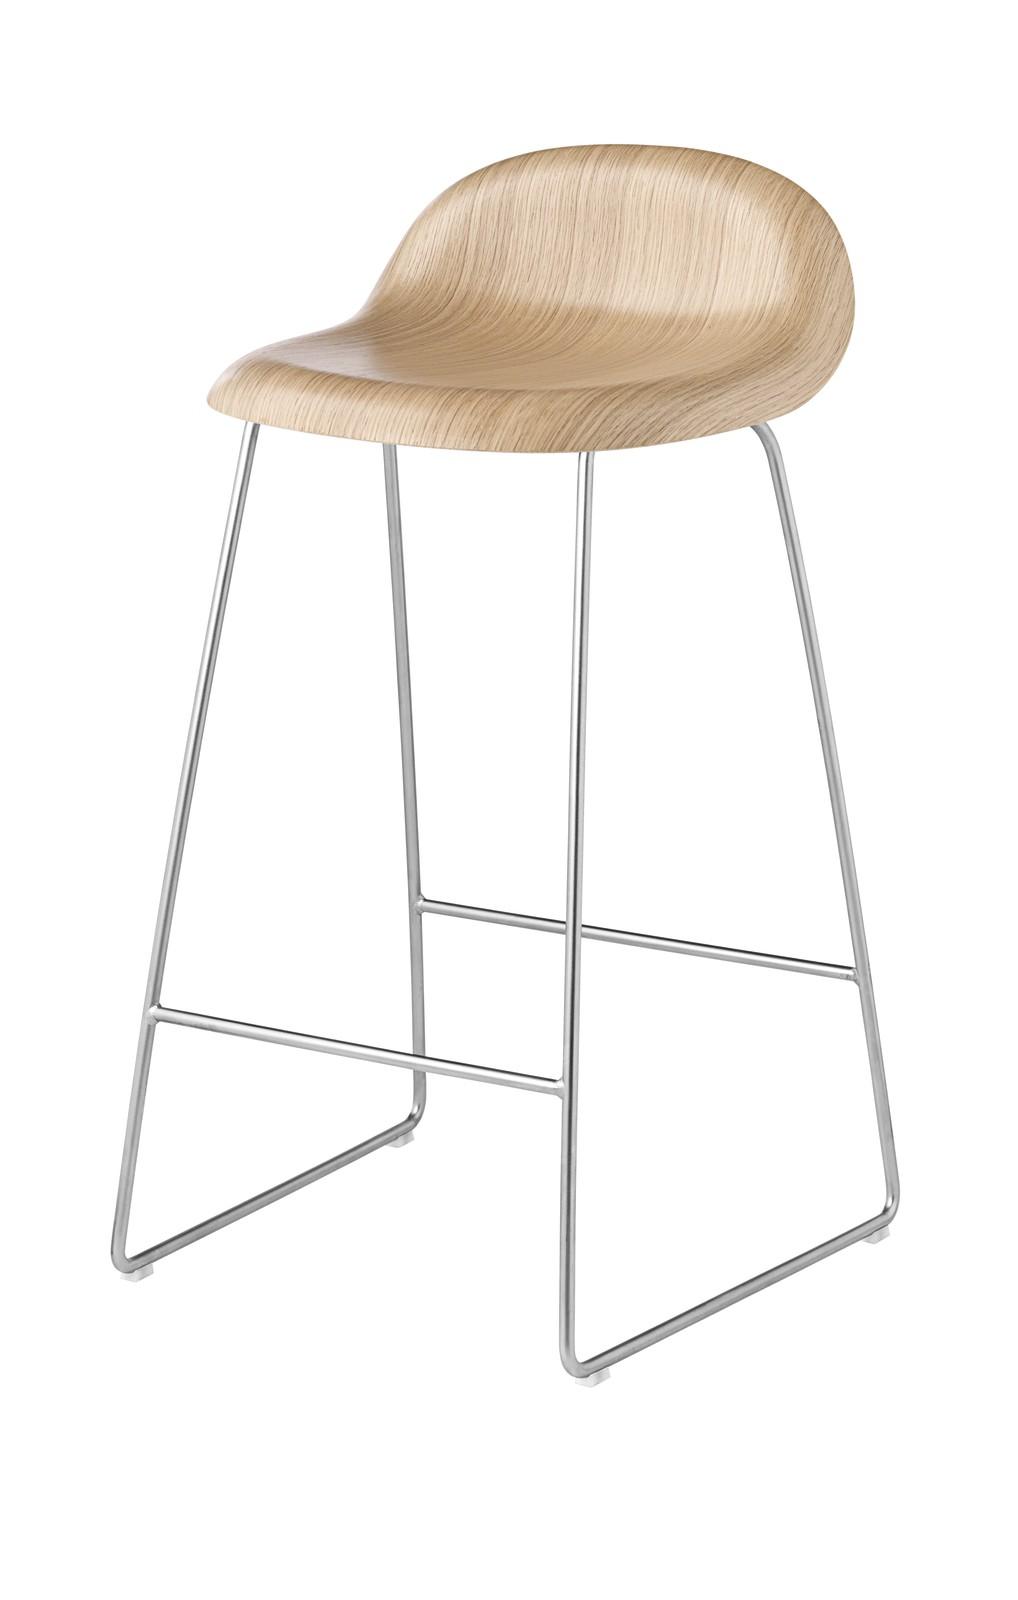 Gubi 3D Sledge Base Counter Stool - Unupholstered Gubi Wood Oak, Gubi Metal Chrome